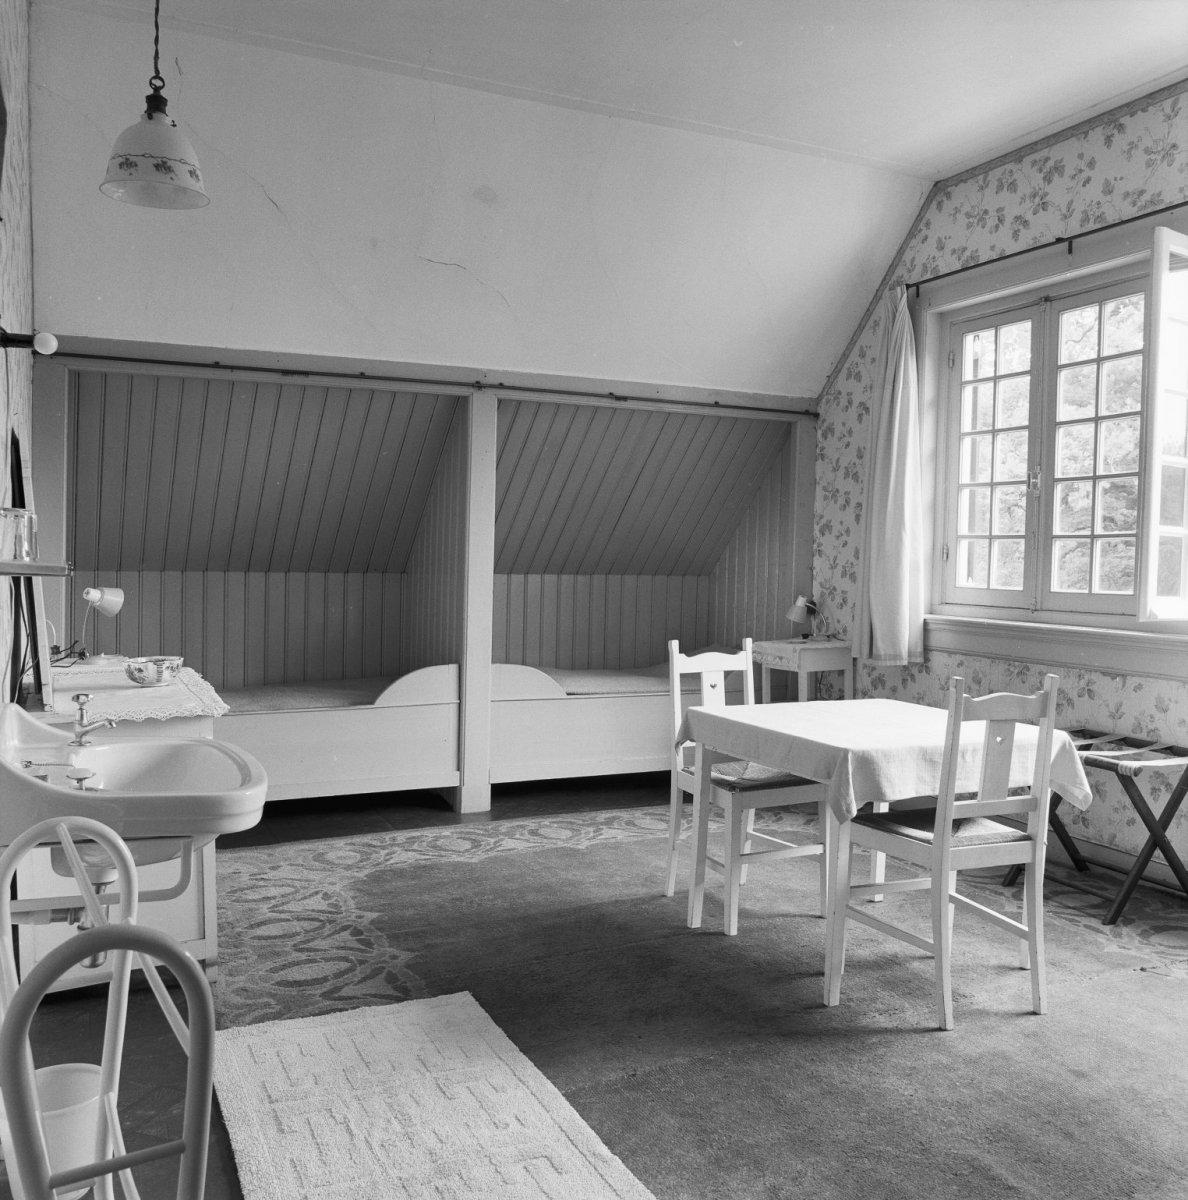 File:Interieur slaapkamer - Beuningen - 20034292 - RCE.jpg - Wikimedia ...